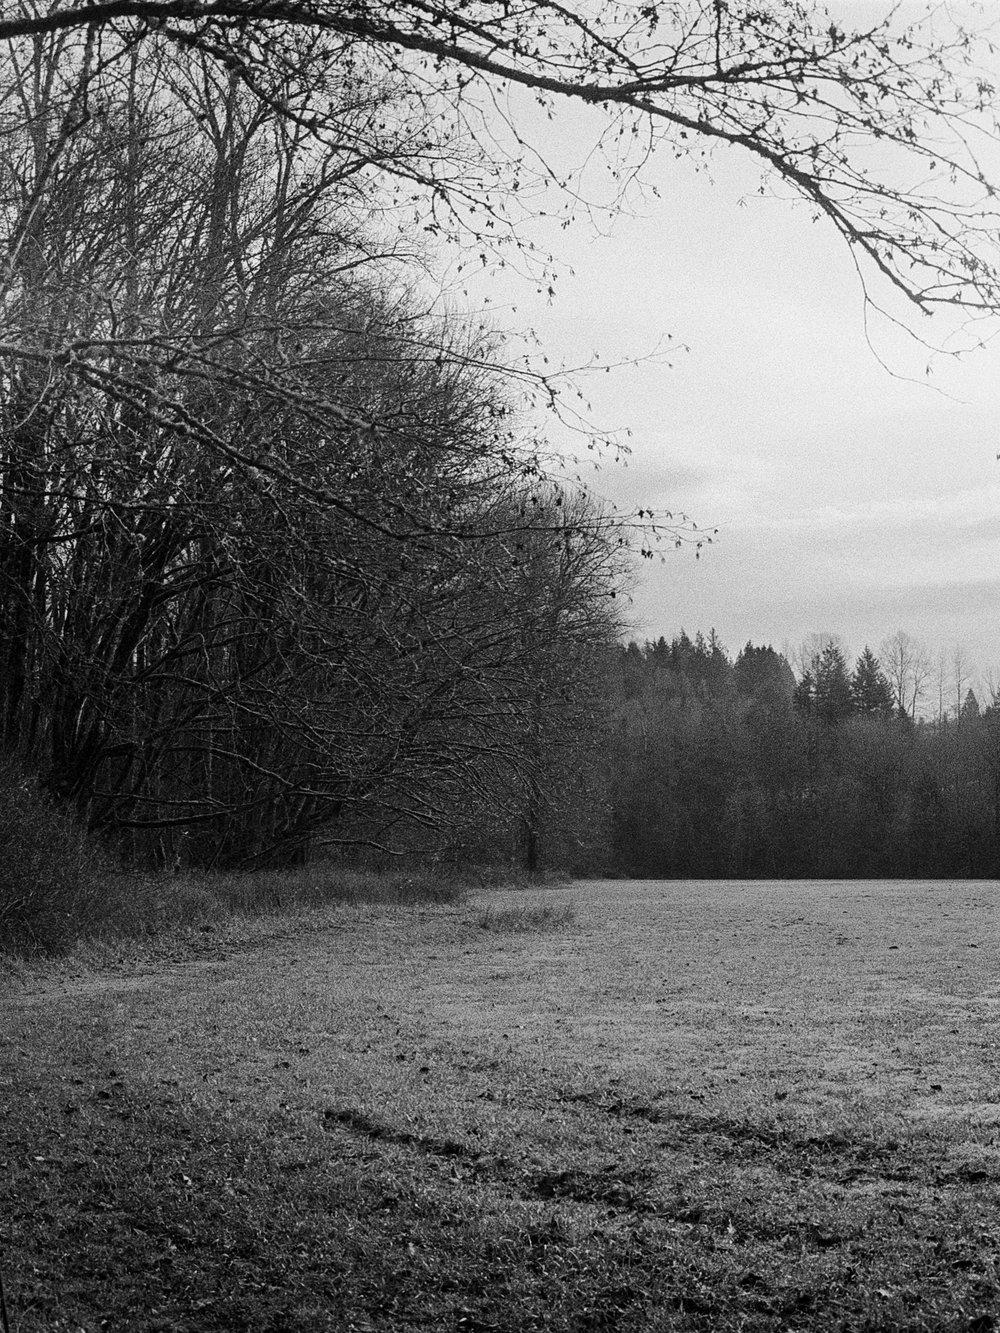 The Field's Edge | Minolta XD5 + Minolta 50/1.4 - Ilford HP5+